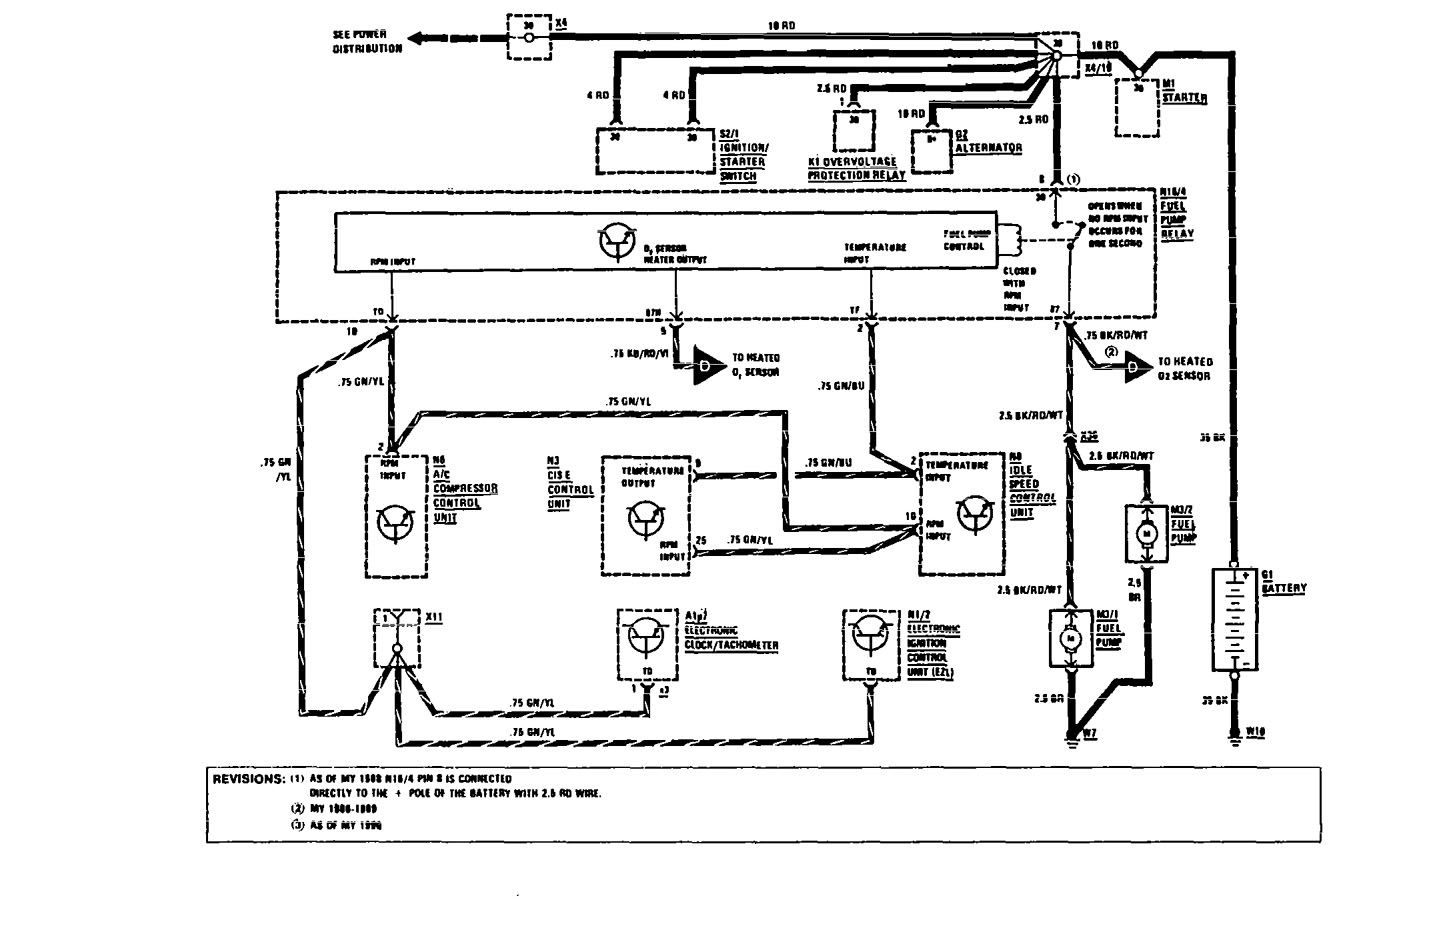 Fuse Wiring Diagram Mercedes 560sec Diagrams 1991 Benz Fuel Kenworth Panel 2001 F550